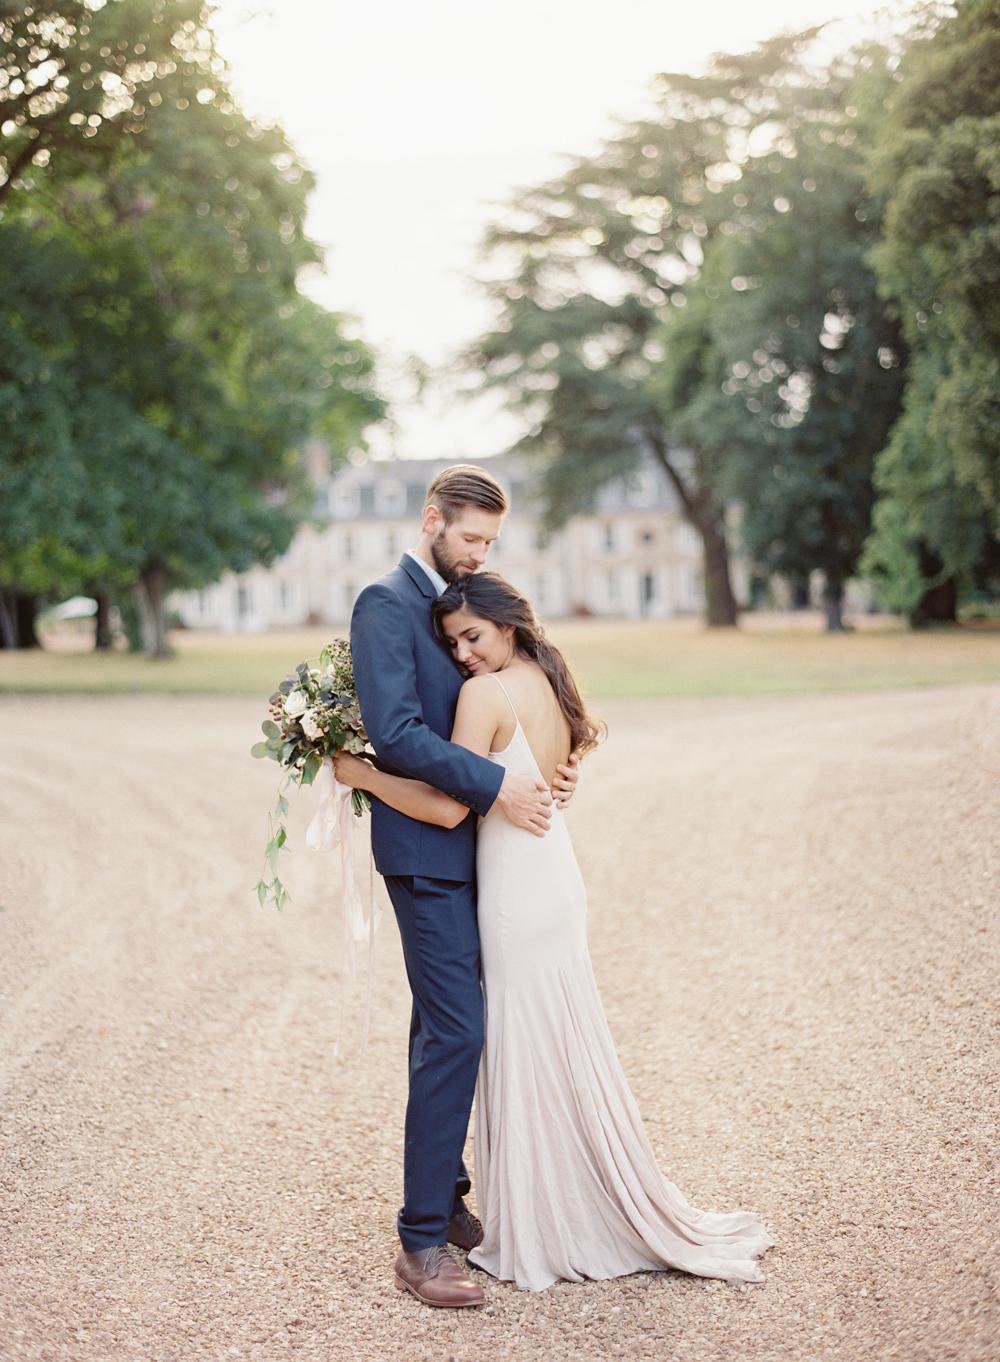 Vicki Grafton Photography Paris France Chateau wedding  Film Wedding photographer -24.jpg